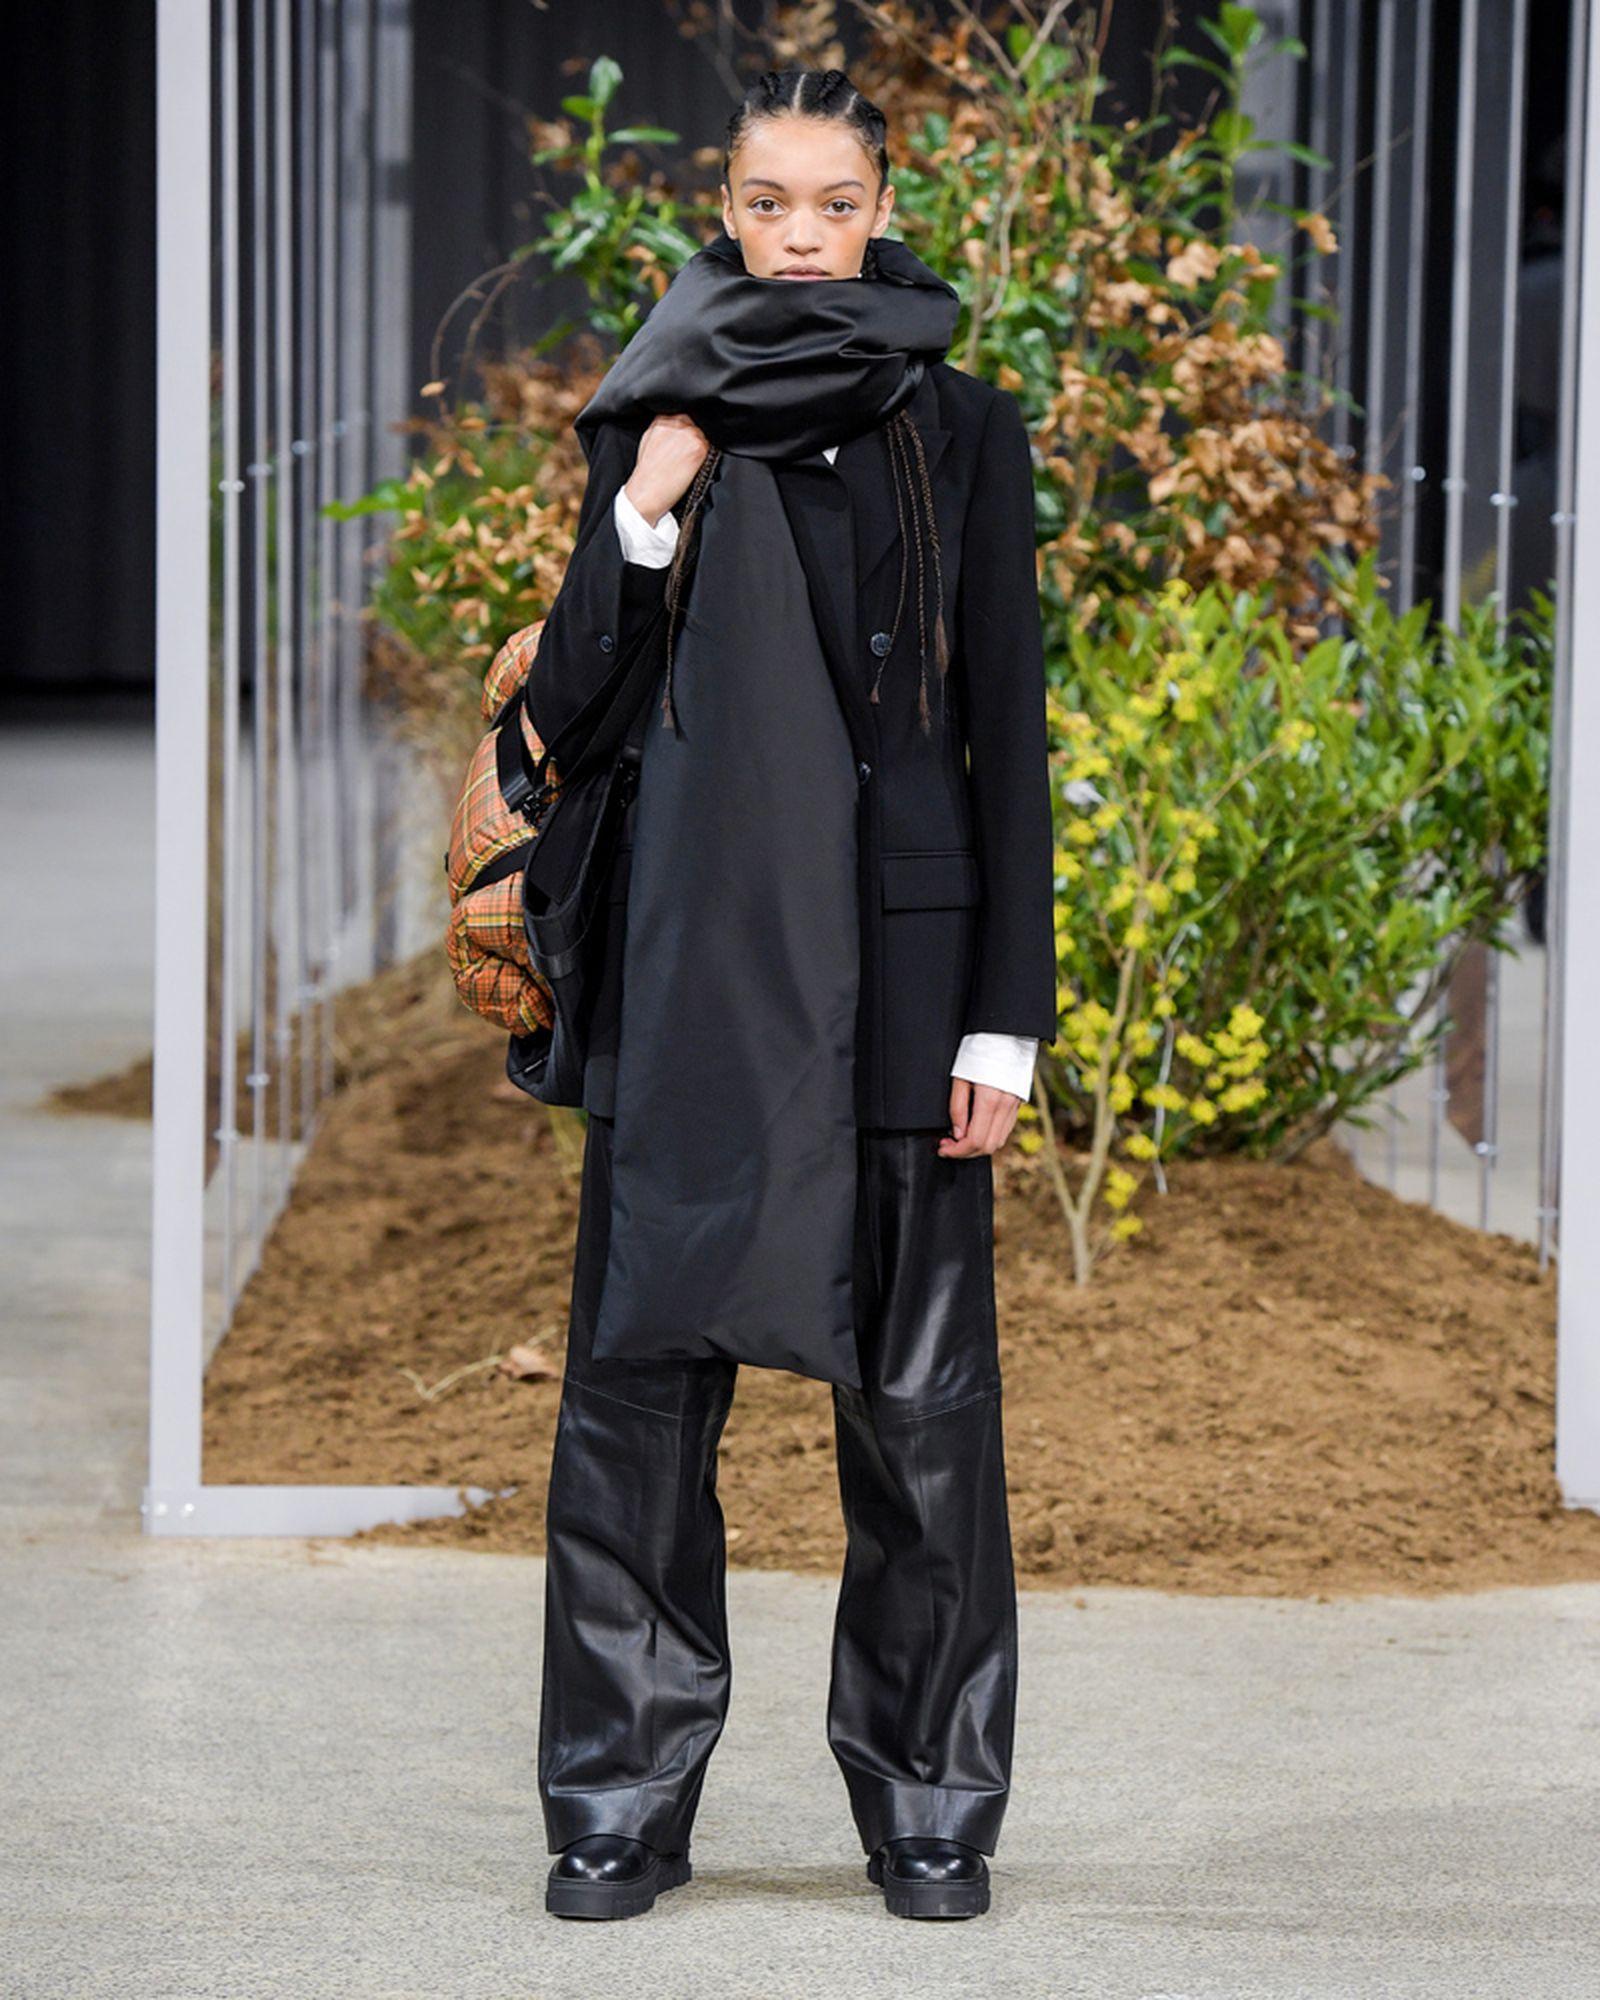 future-fashion-week-copenhagen-holz-9